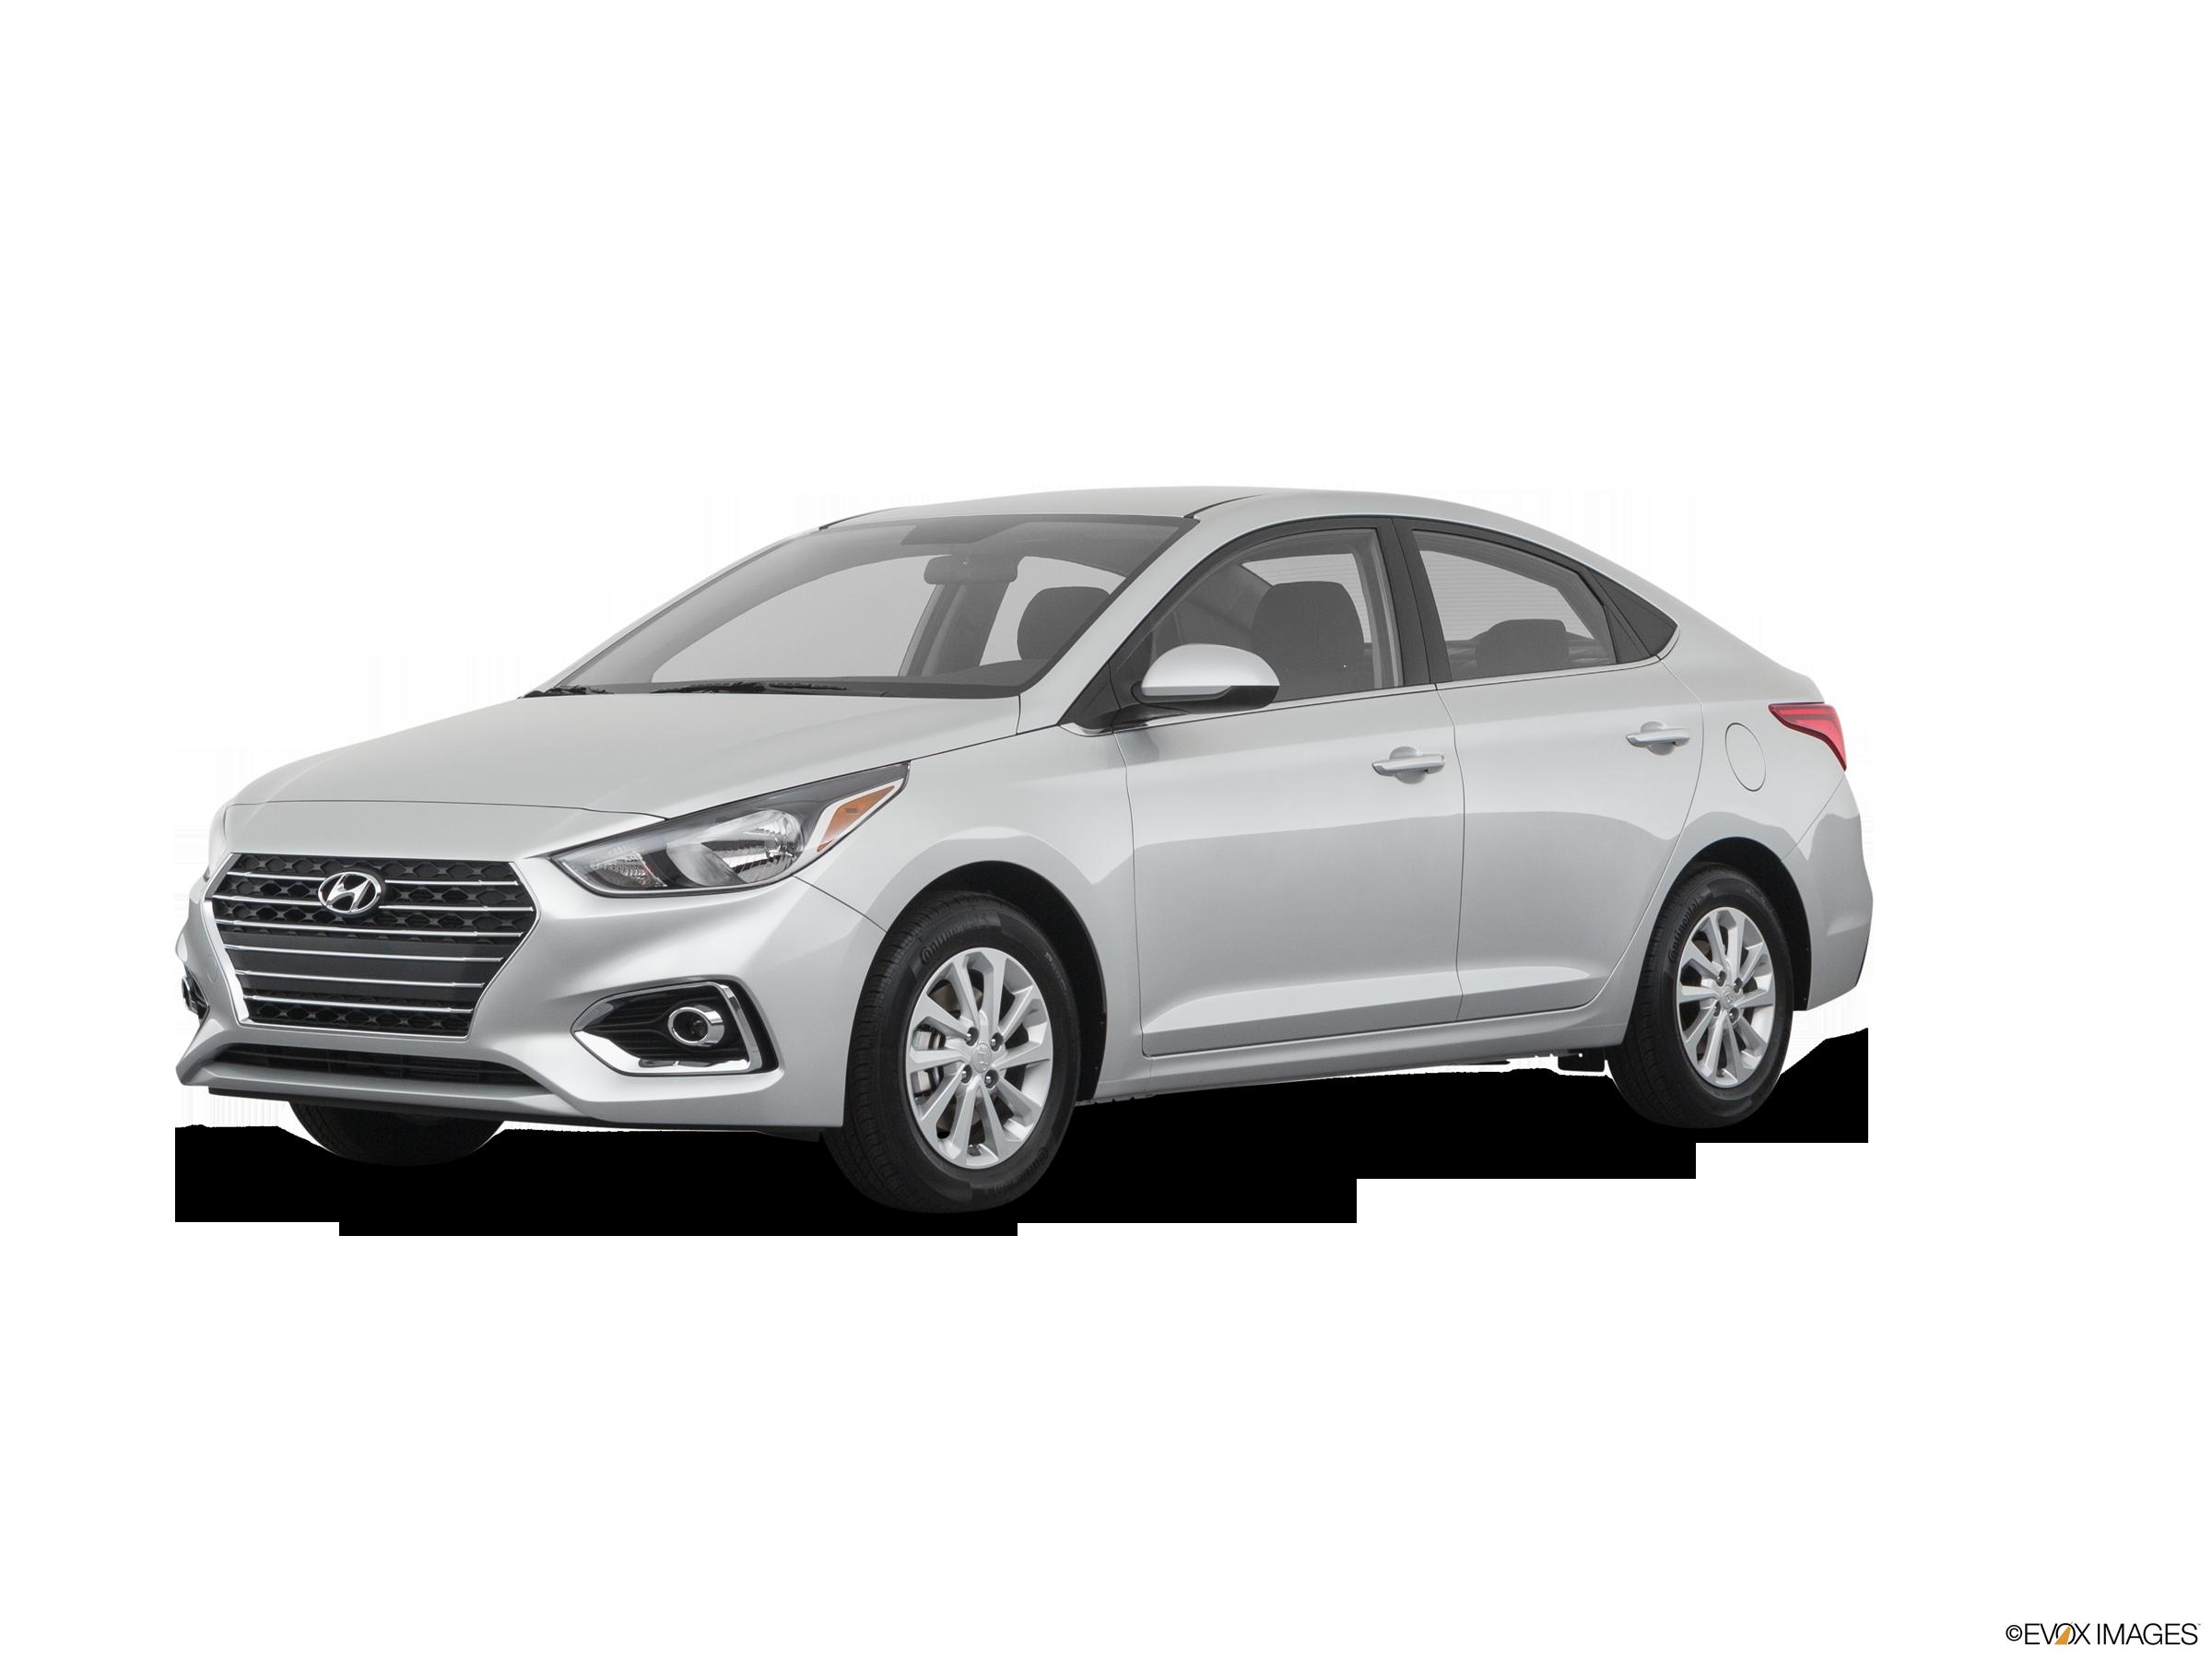 Hyundai Accent Hatchback >> 2019 Hyundai Accent Pricing Reviews Ratings Kelley Blue